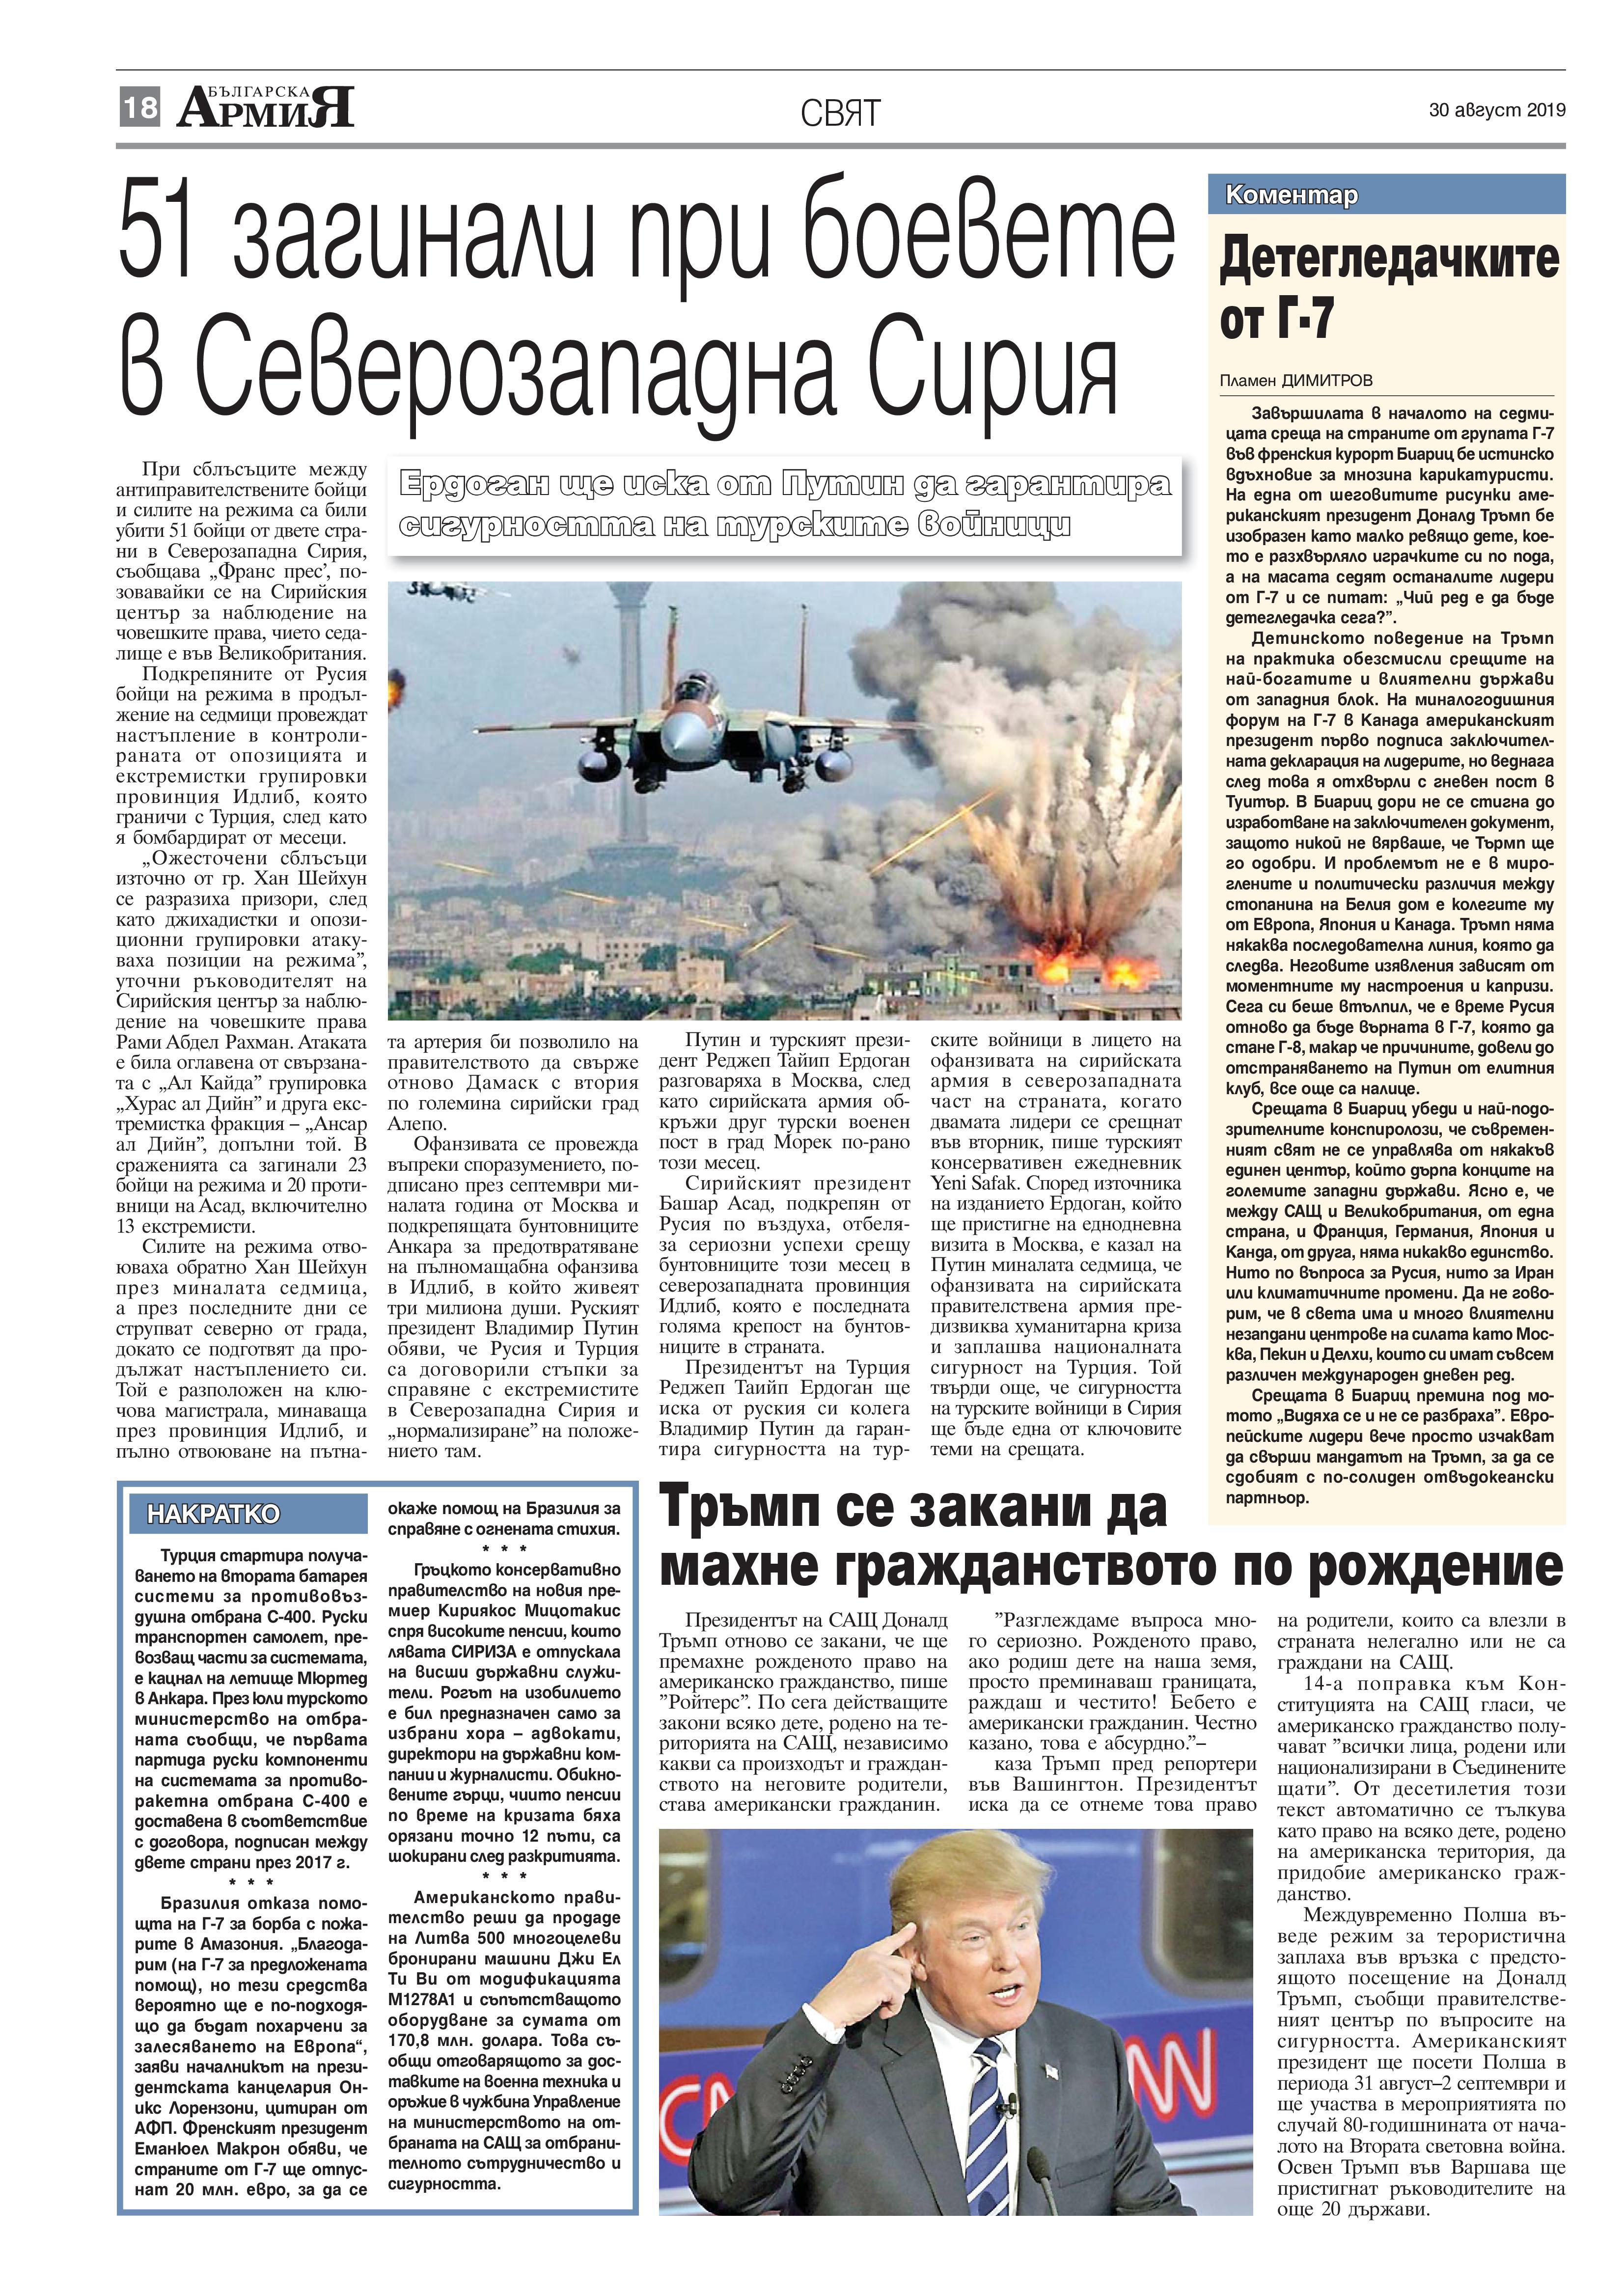 https://armymedia.bg/wp-content/uploads/2015/06/18-31.jpg